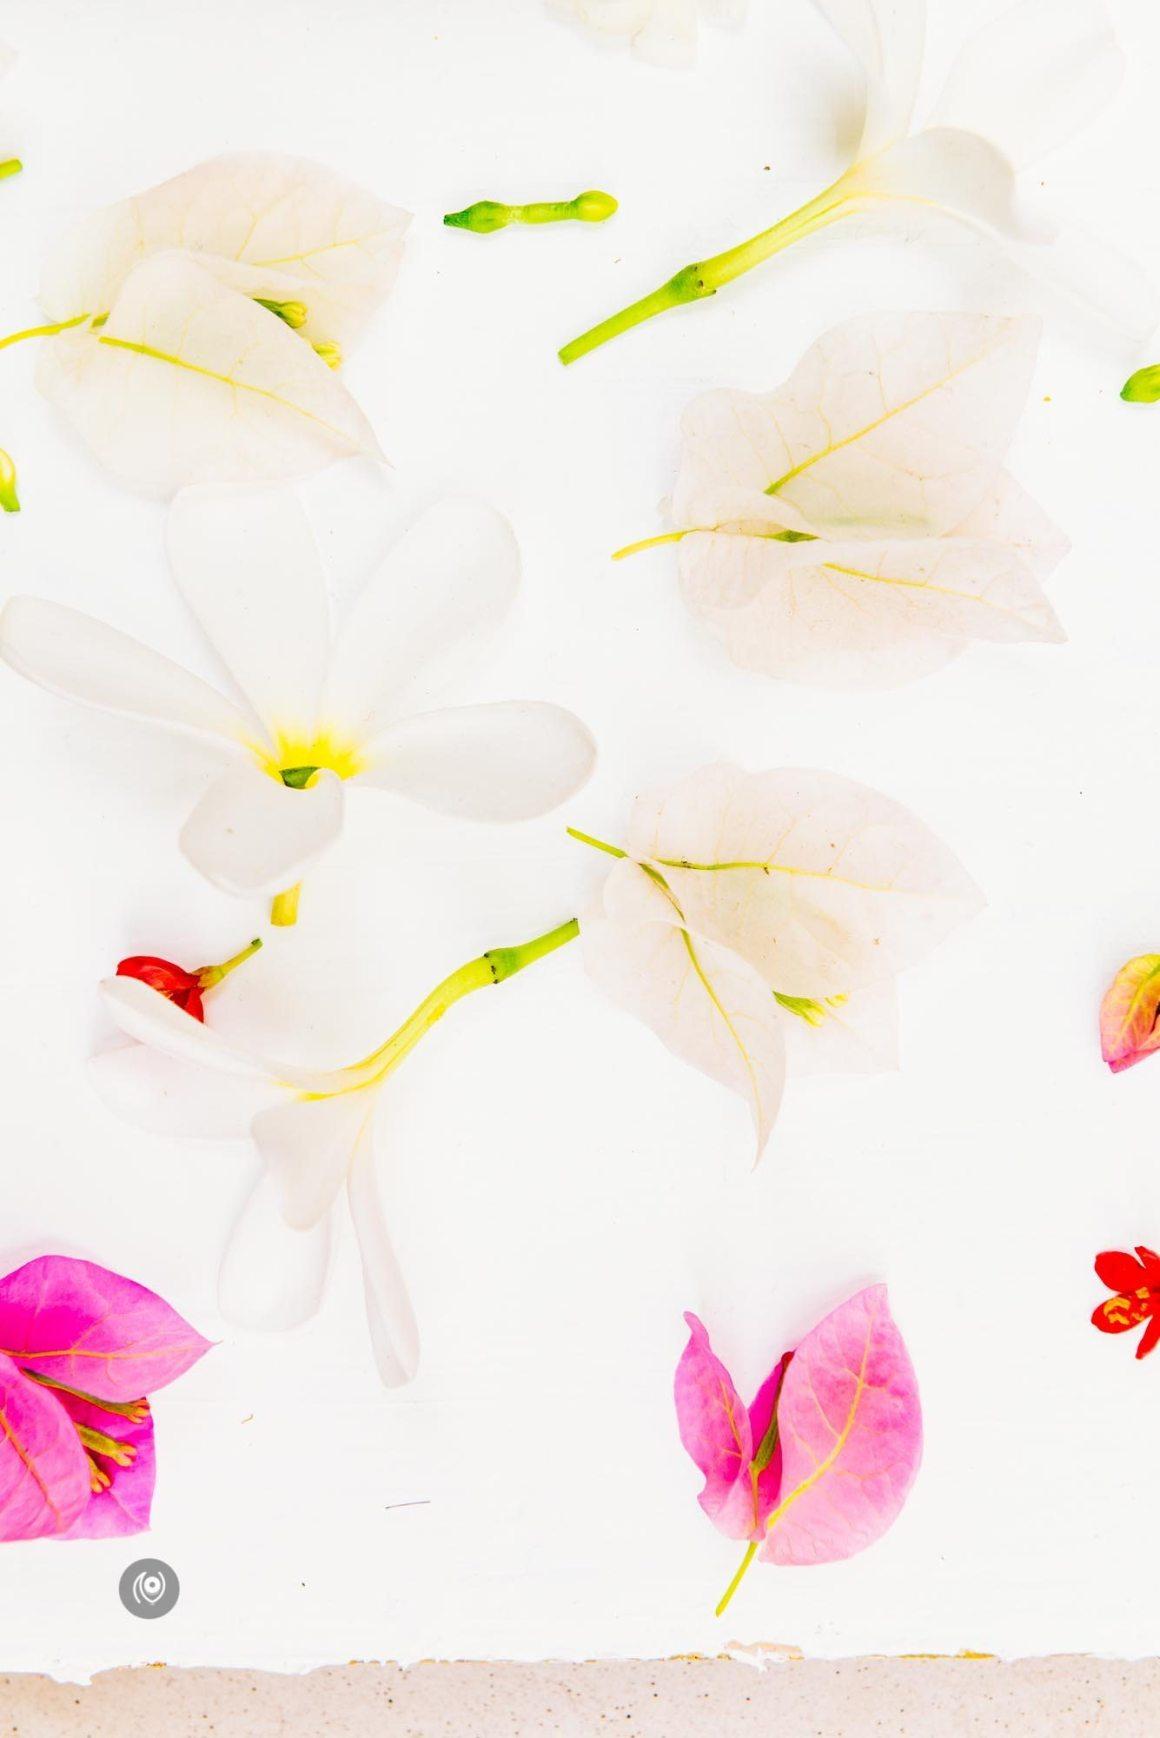 FragranceOfTheMonth-Naina.co-Jour-Hermes-Gardenia-EyesForLuxury-08